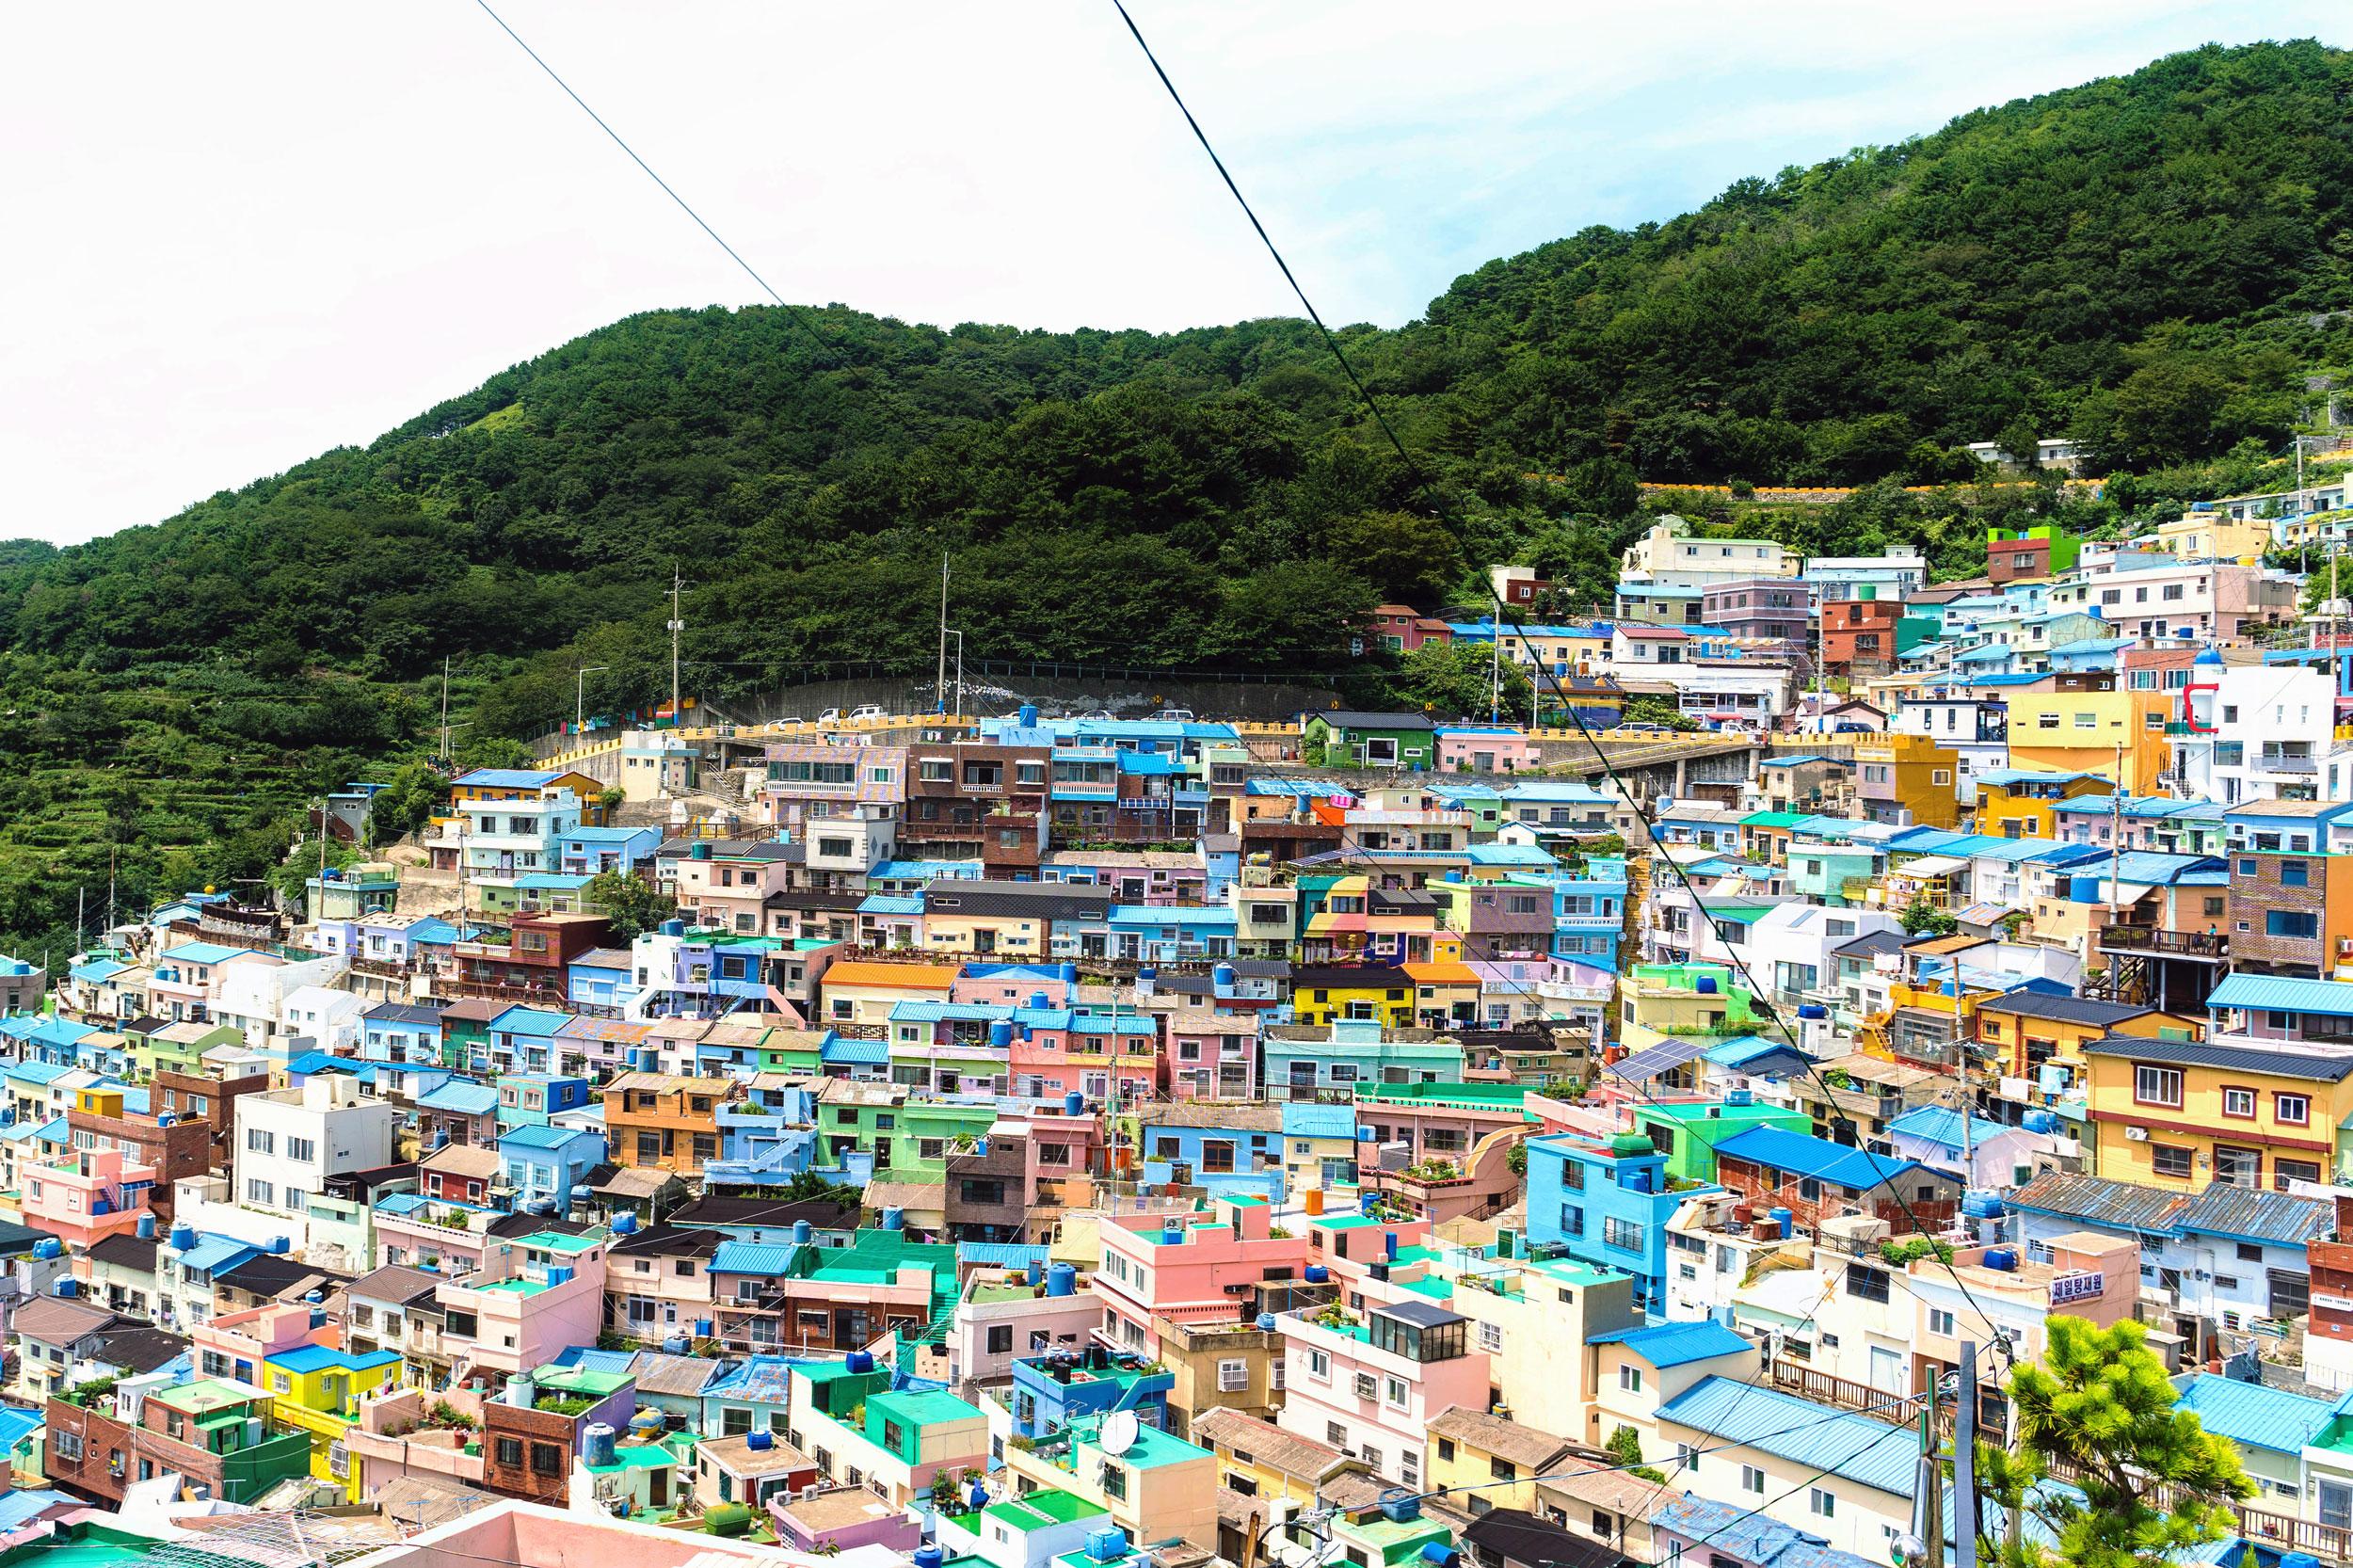 Gamcheon Culture Village in Busan, Korea